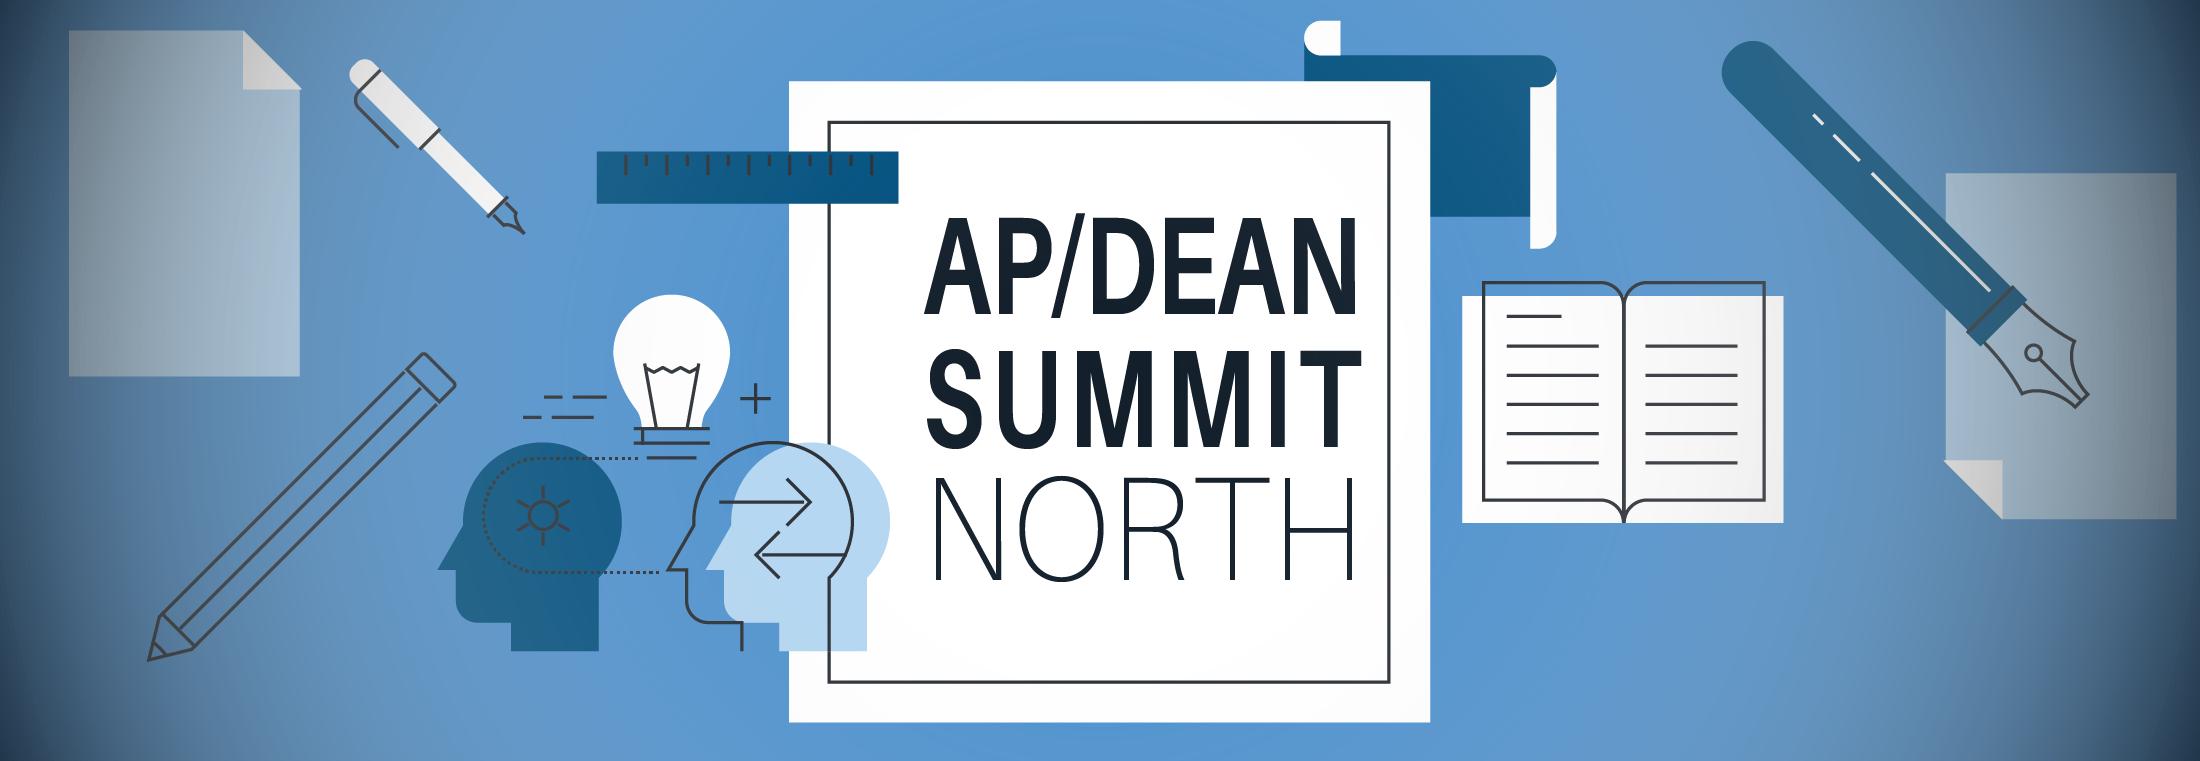 AP Dean Summit North